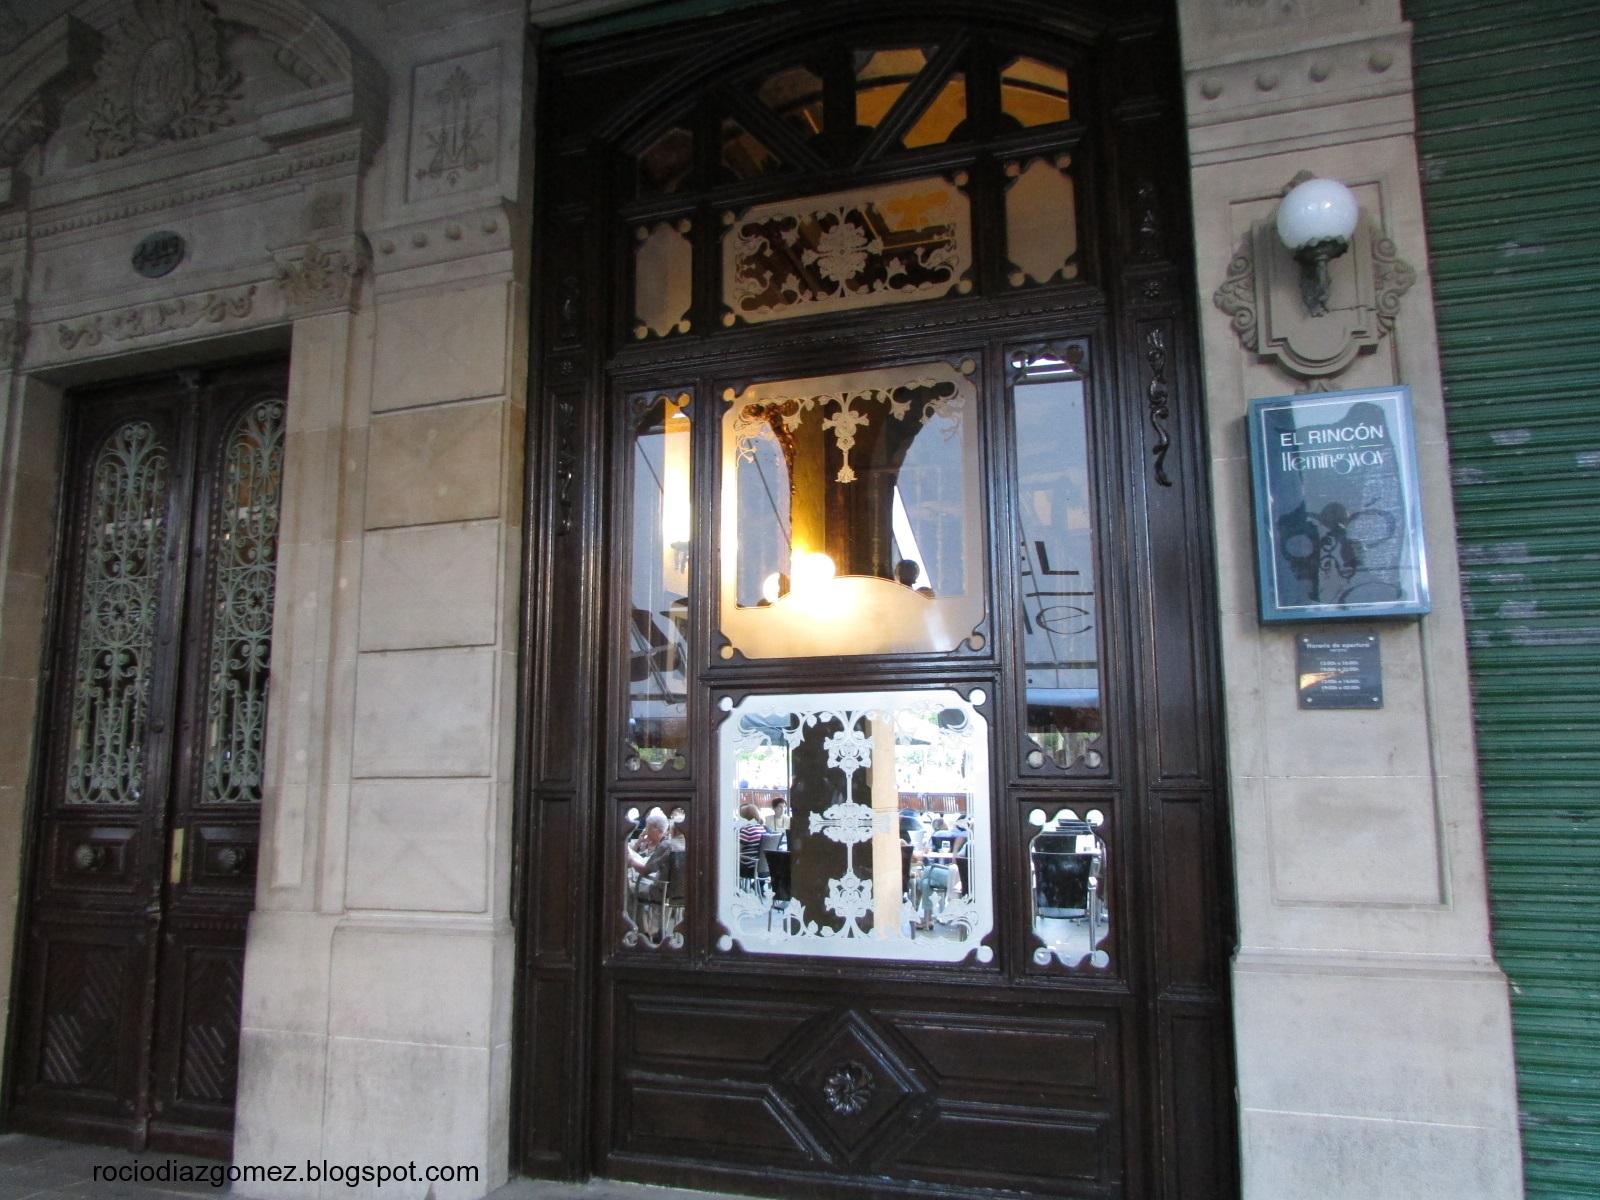 Roc o d az g mez hemingway una ruta literaria por pamplona for Banco bilbao vizcaya oficinas